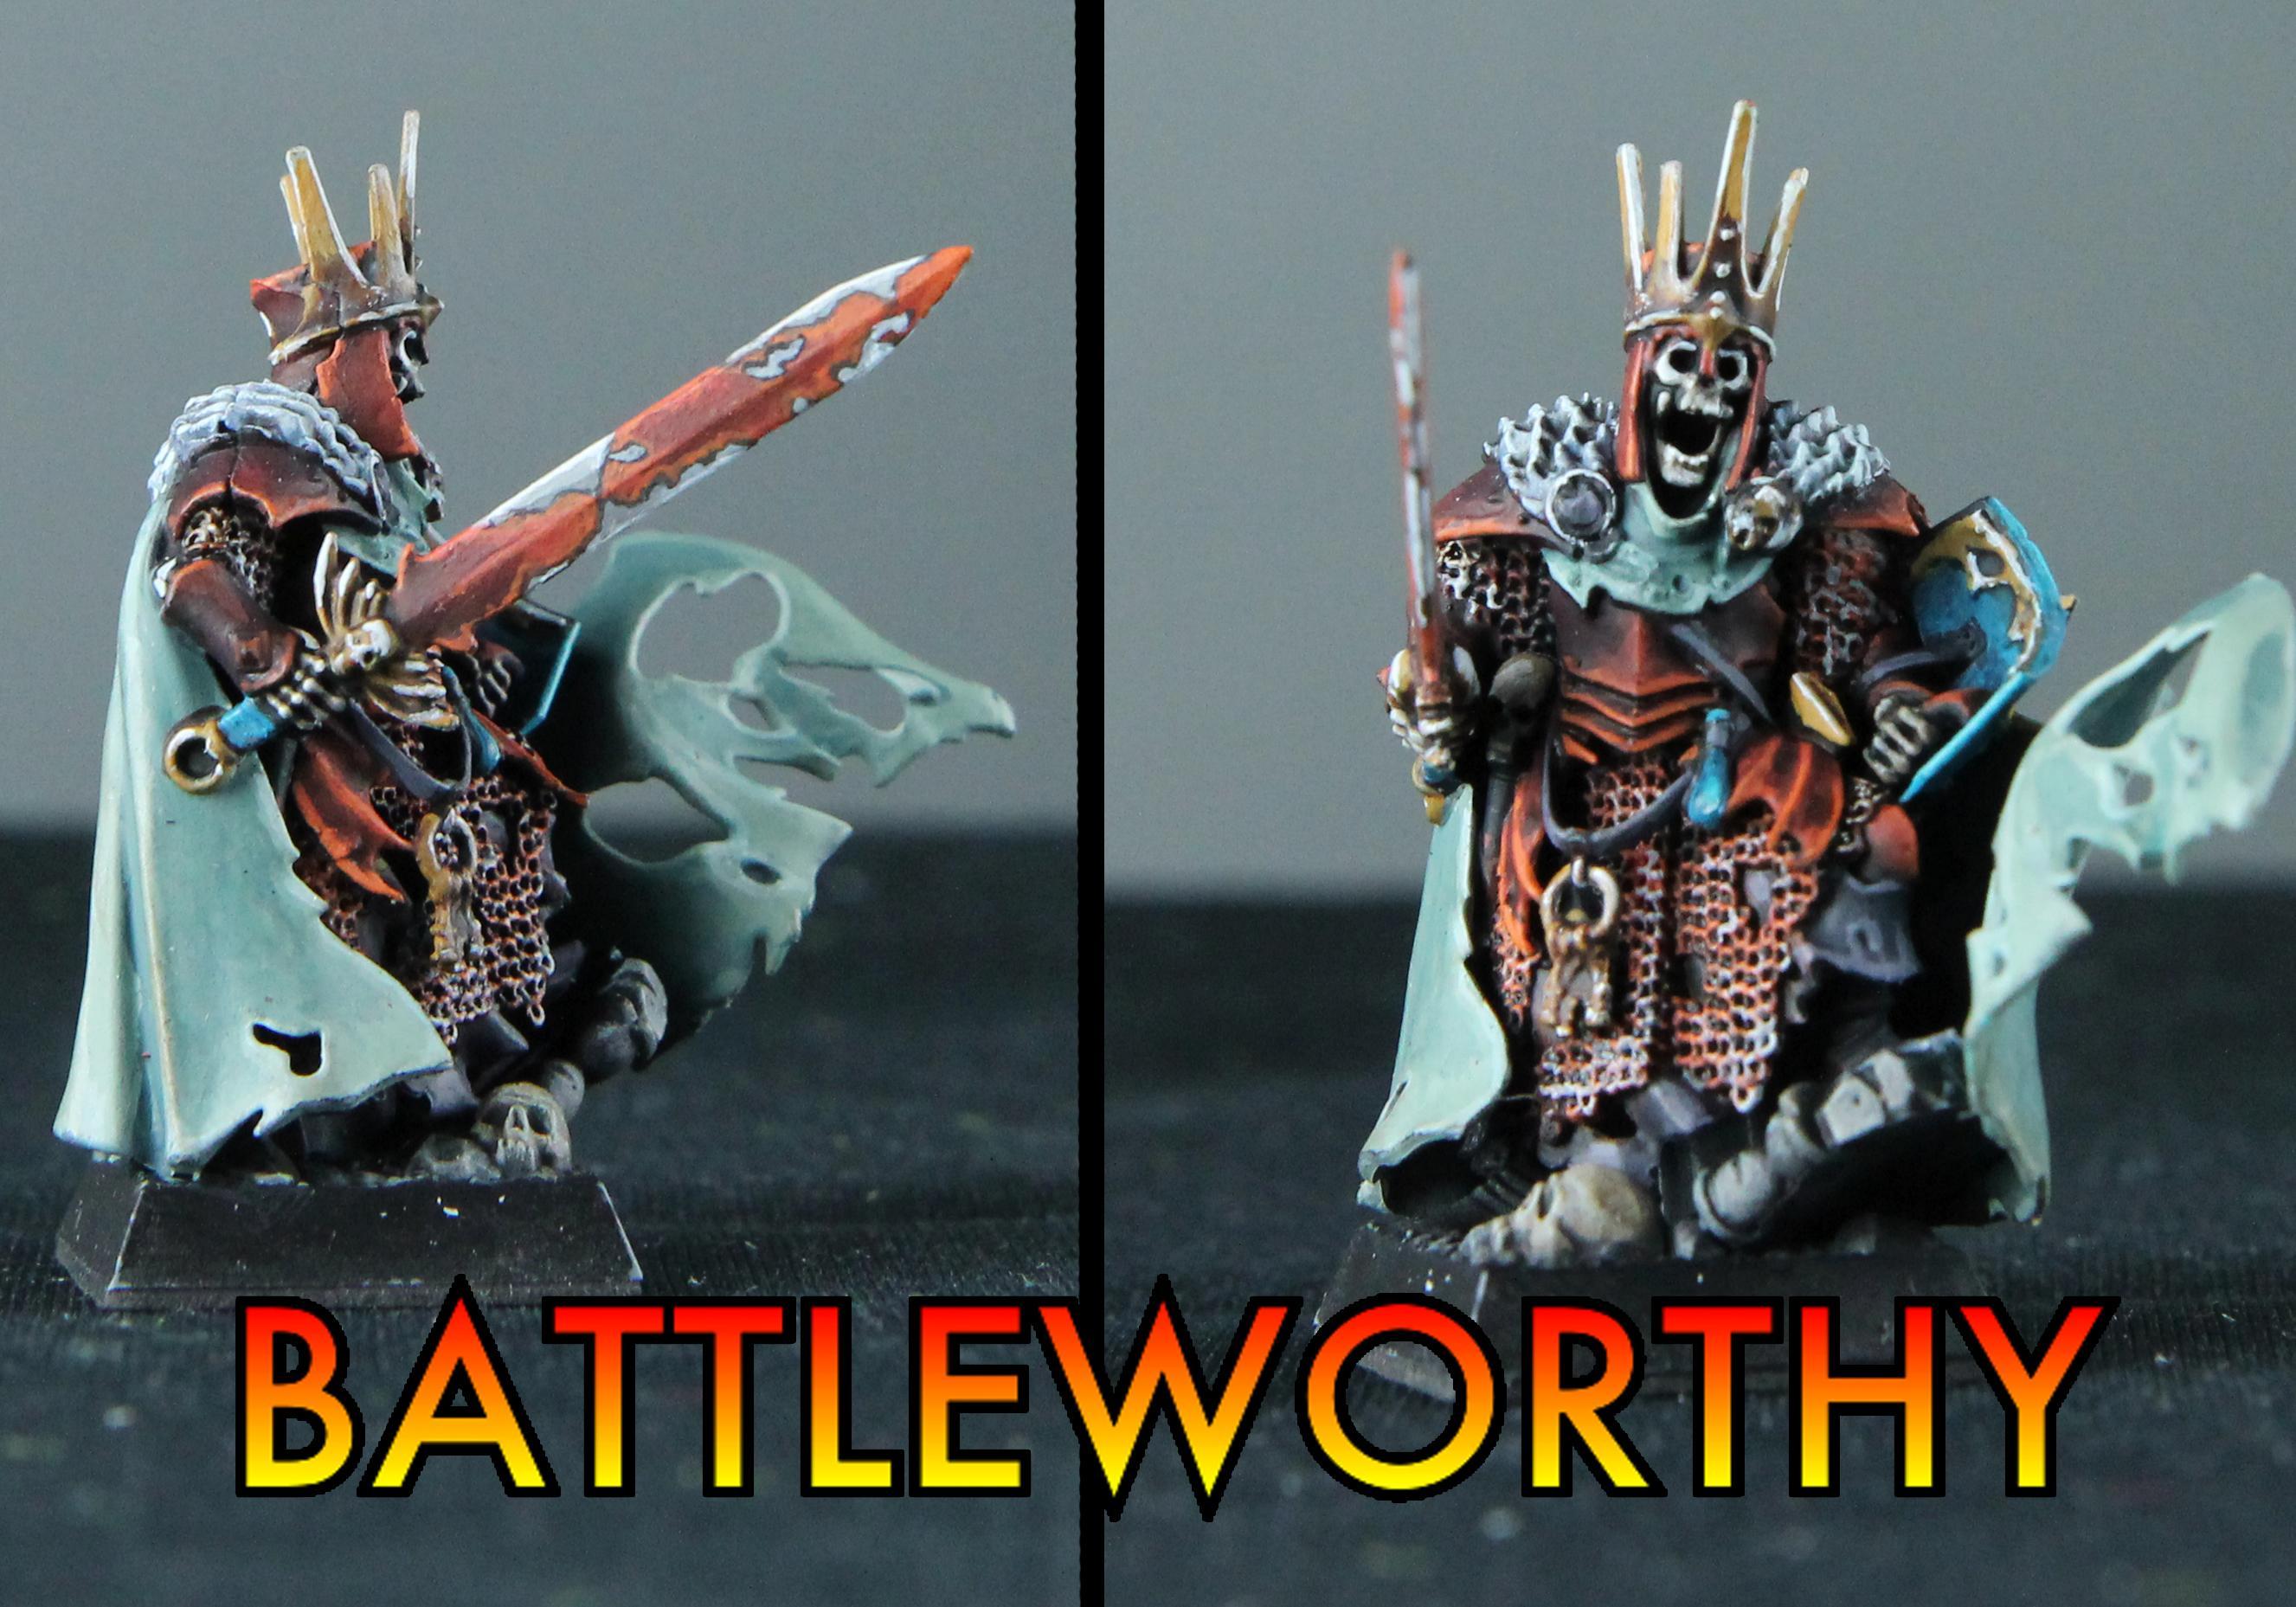 Battleworthy Wight King